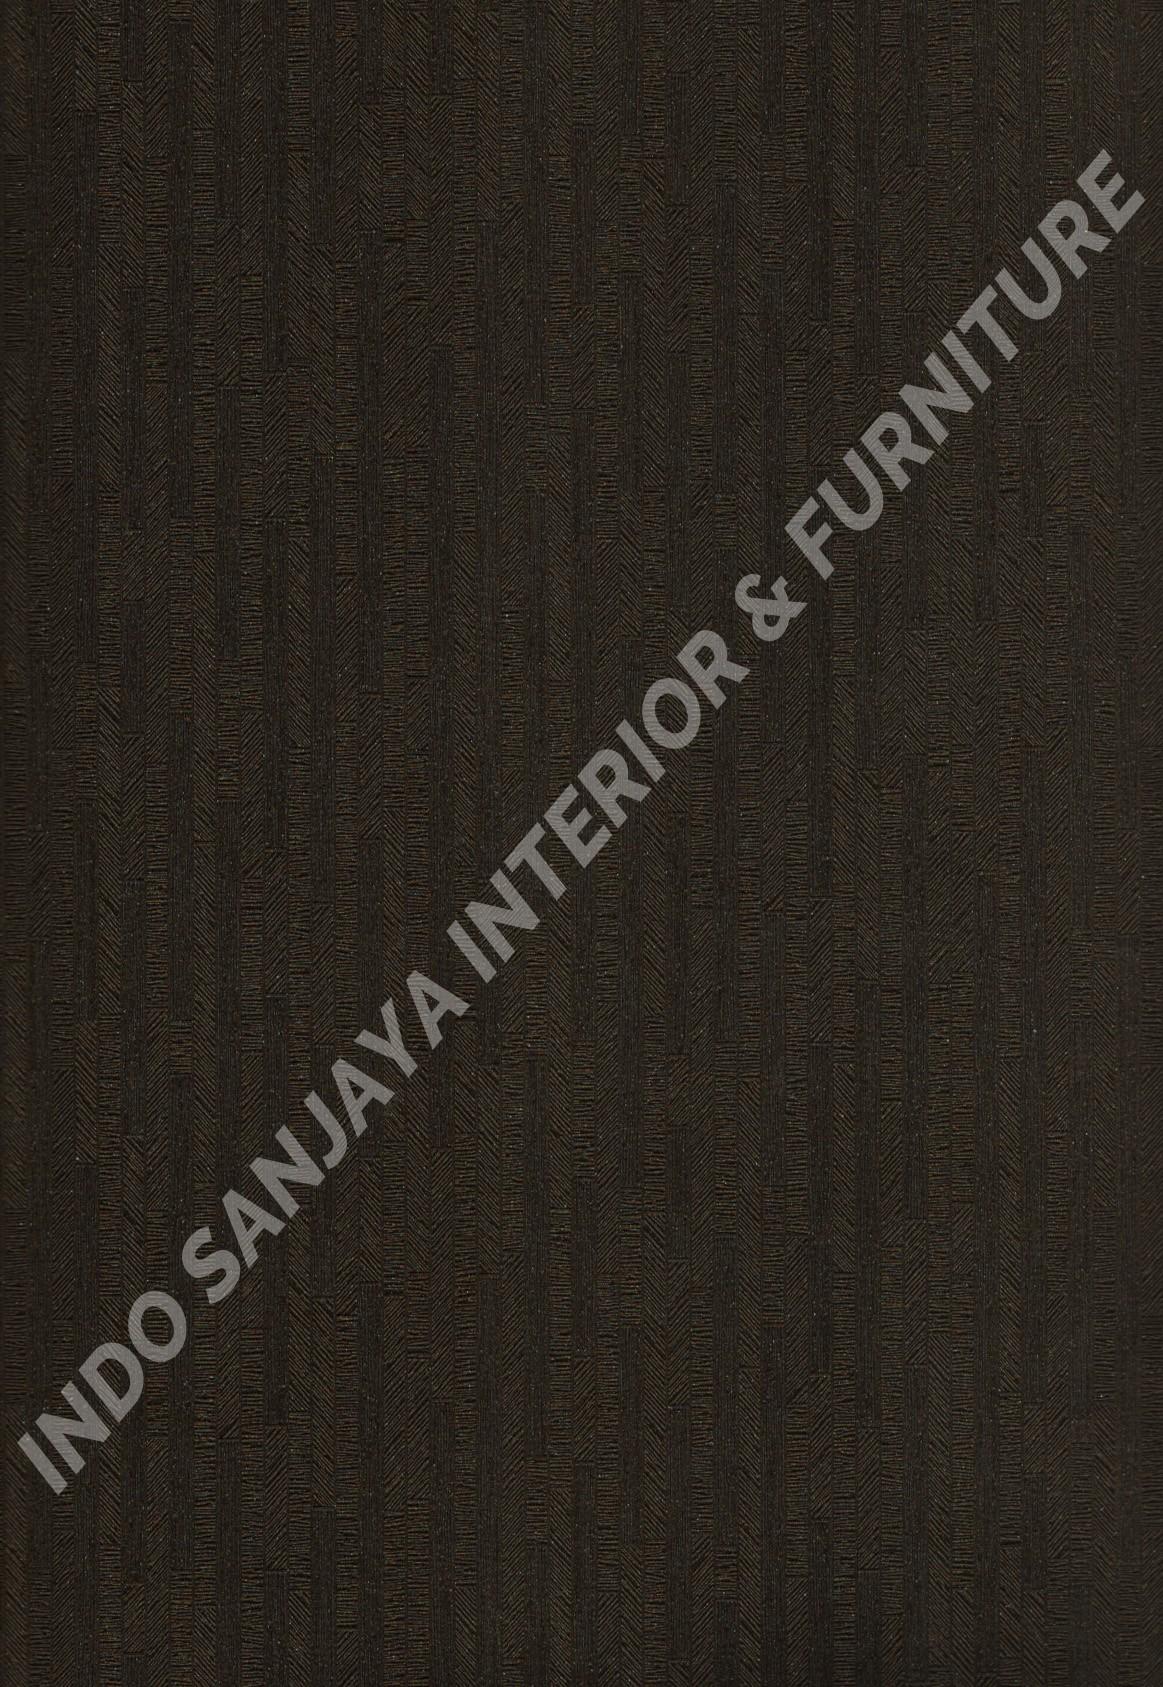 wallpaper   Wallpaper Minimalis Polos 4006-5:4006-5 corak  warna